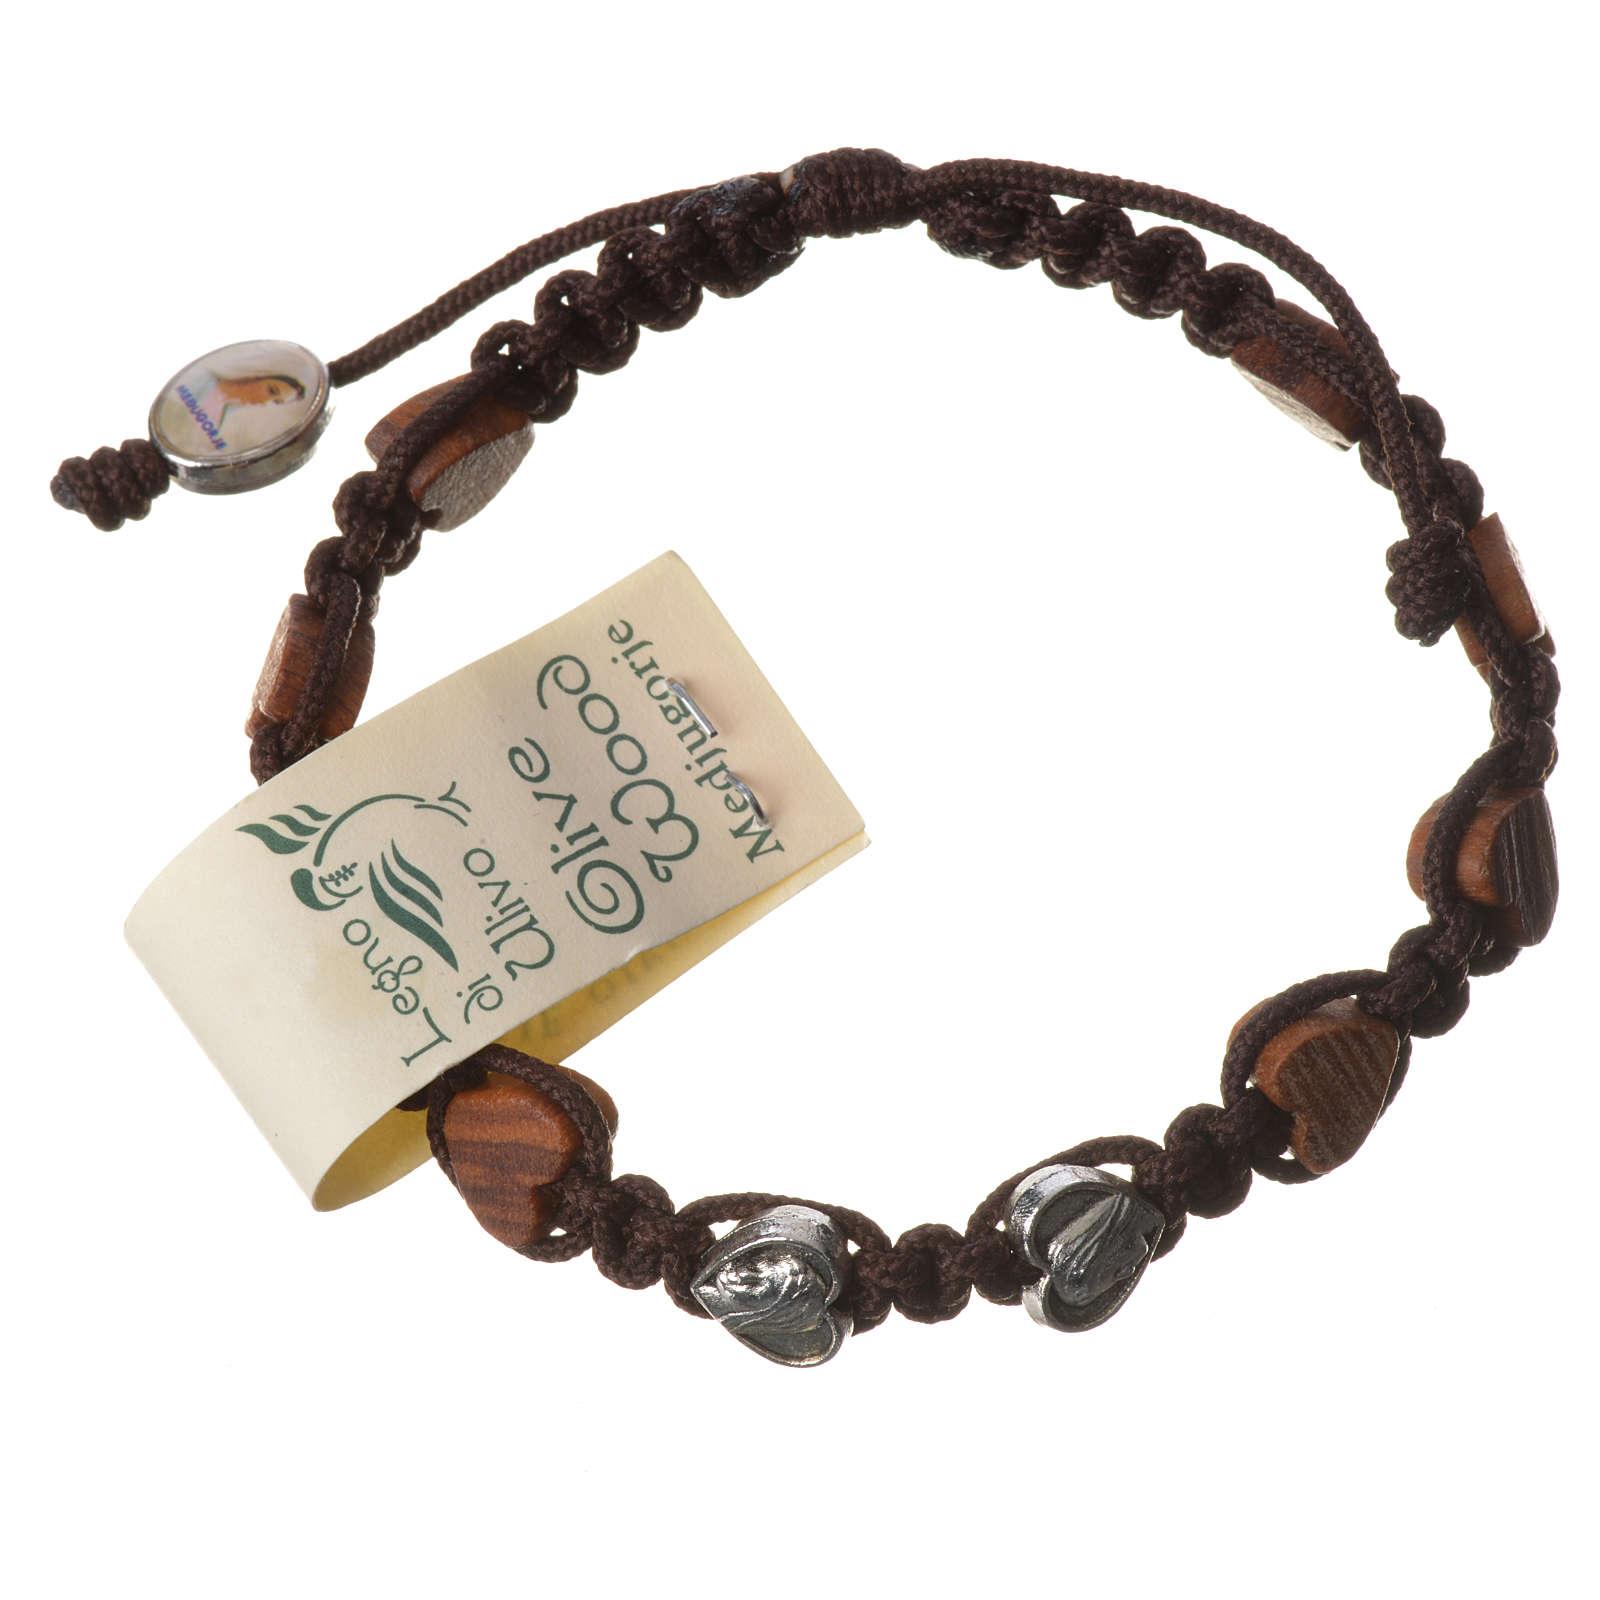 Bracciale Medjugorje corda marrone grani olivo cuore 4